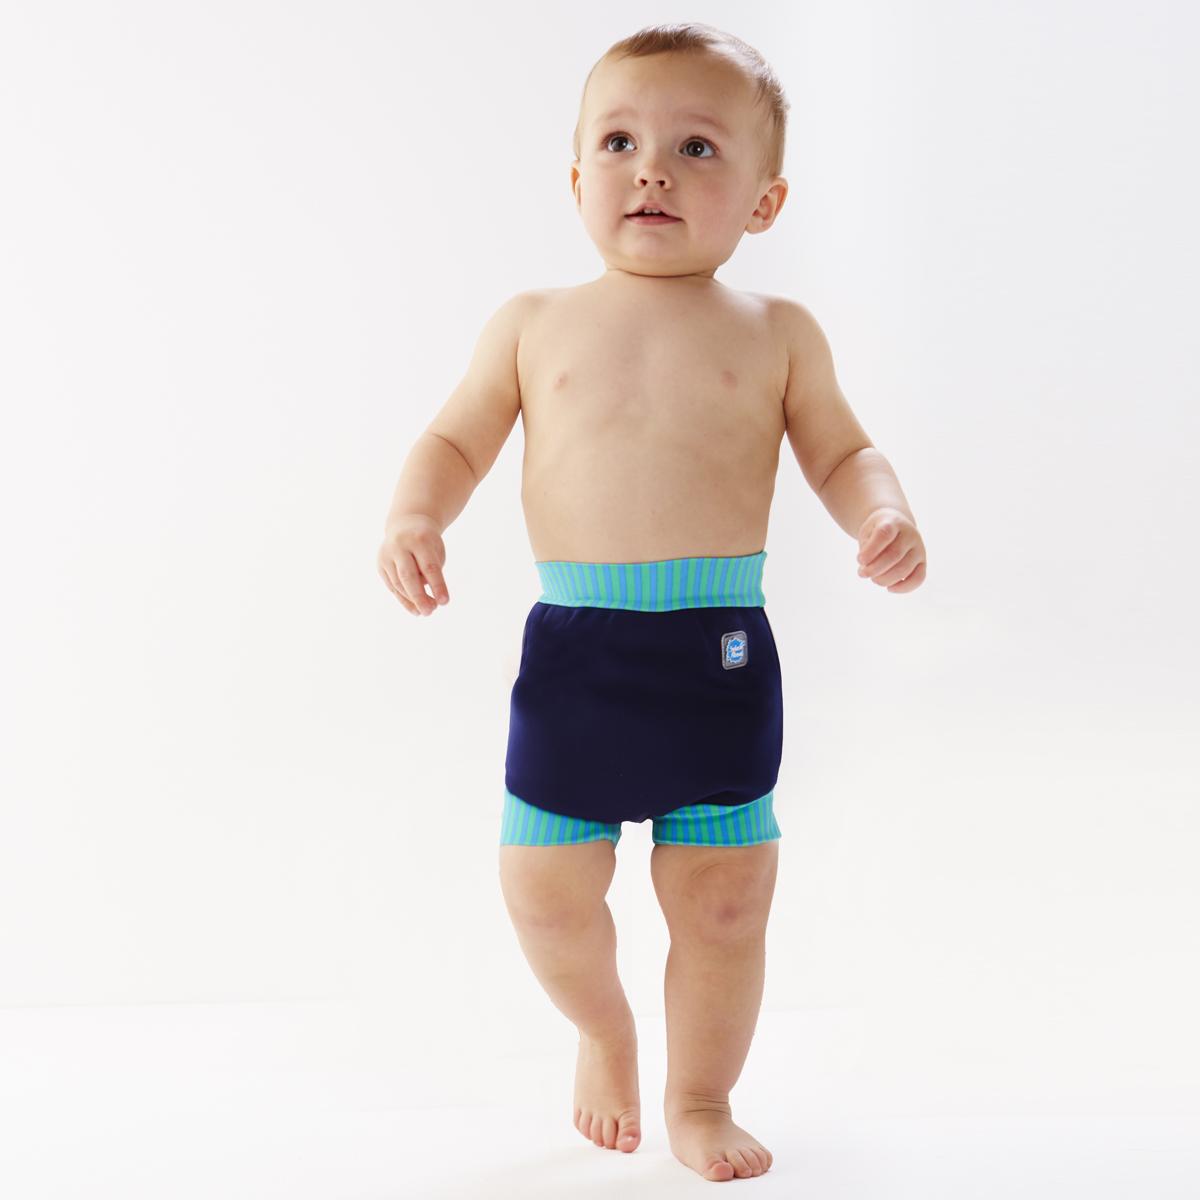 Baby Swimwear, Clothing & Accessories | Splash About